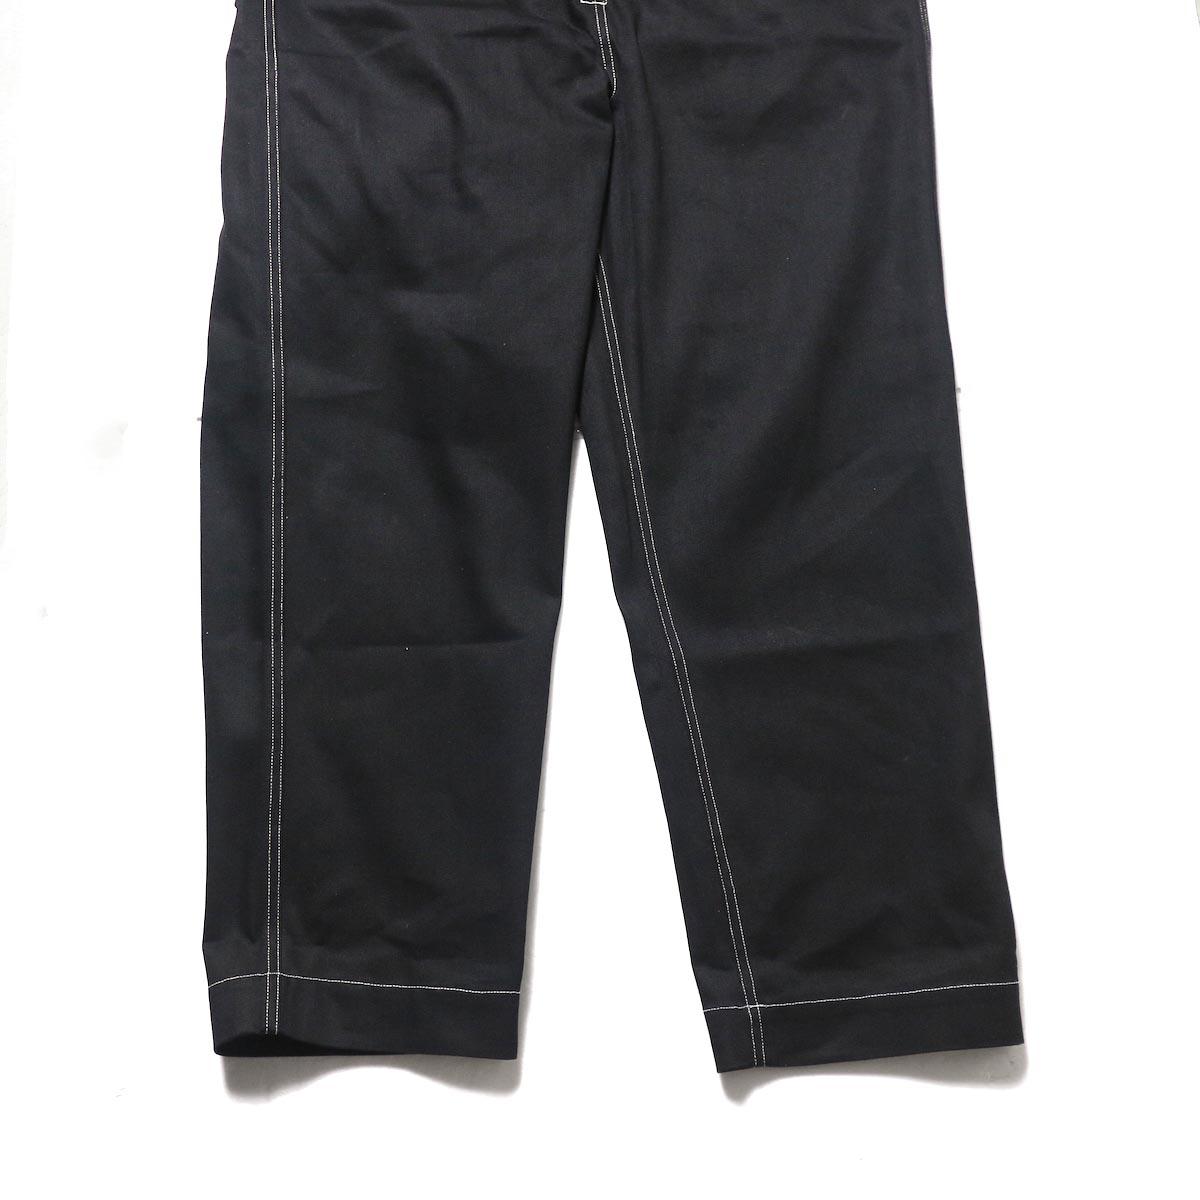 blurhms / U.S Cotton Denim Overalls (Black)裾